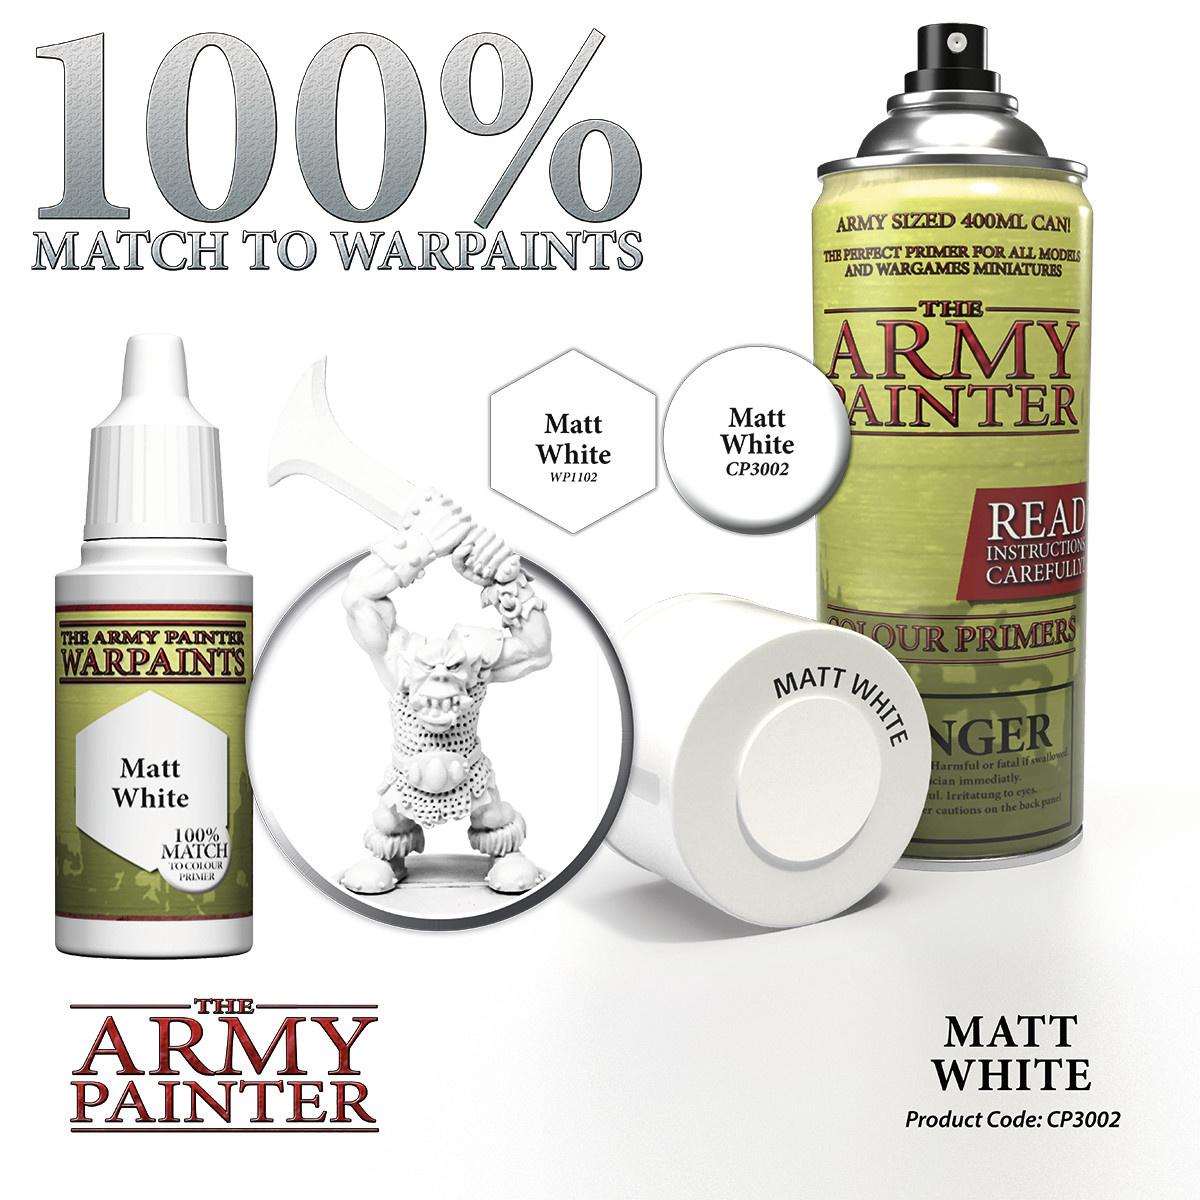 The Army Painter Primer: Base Matt White